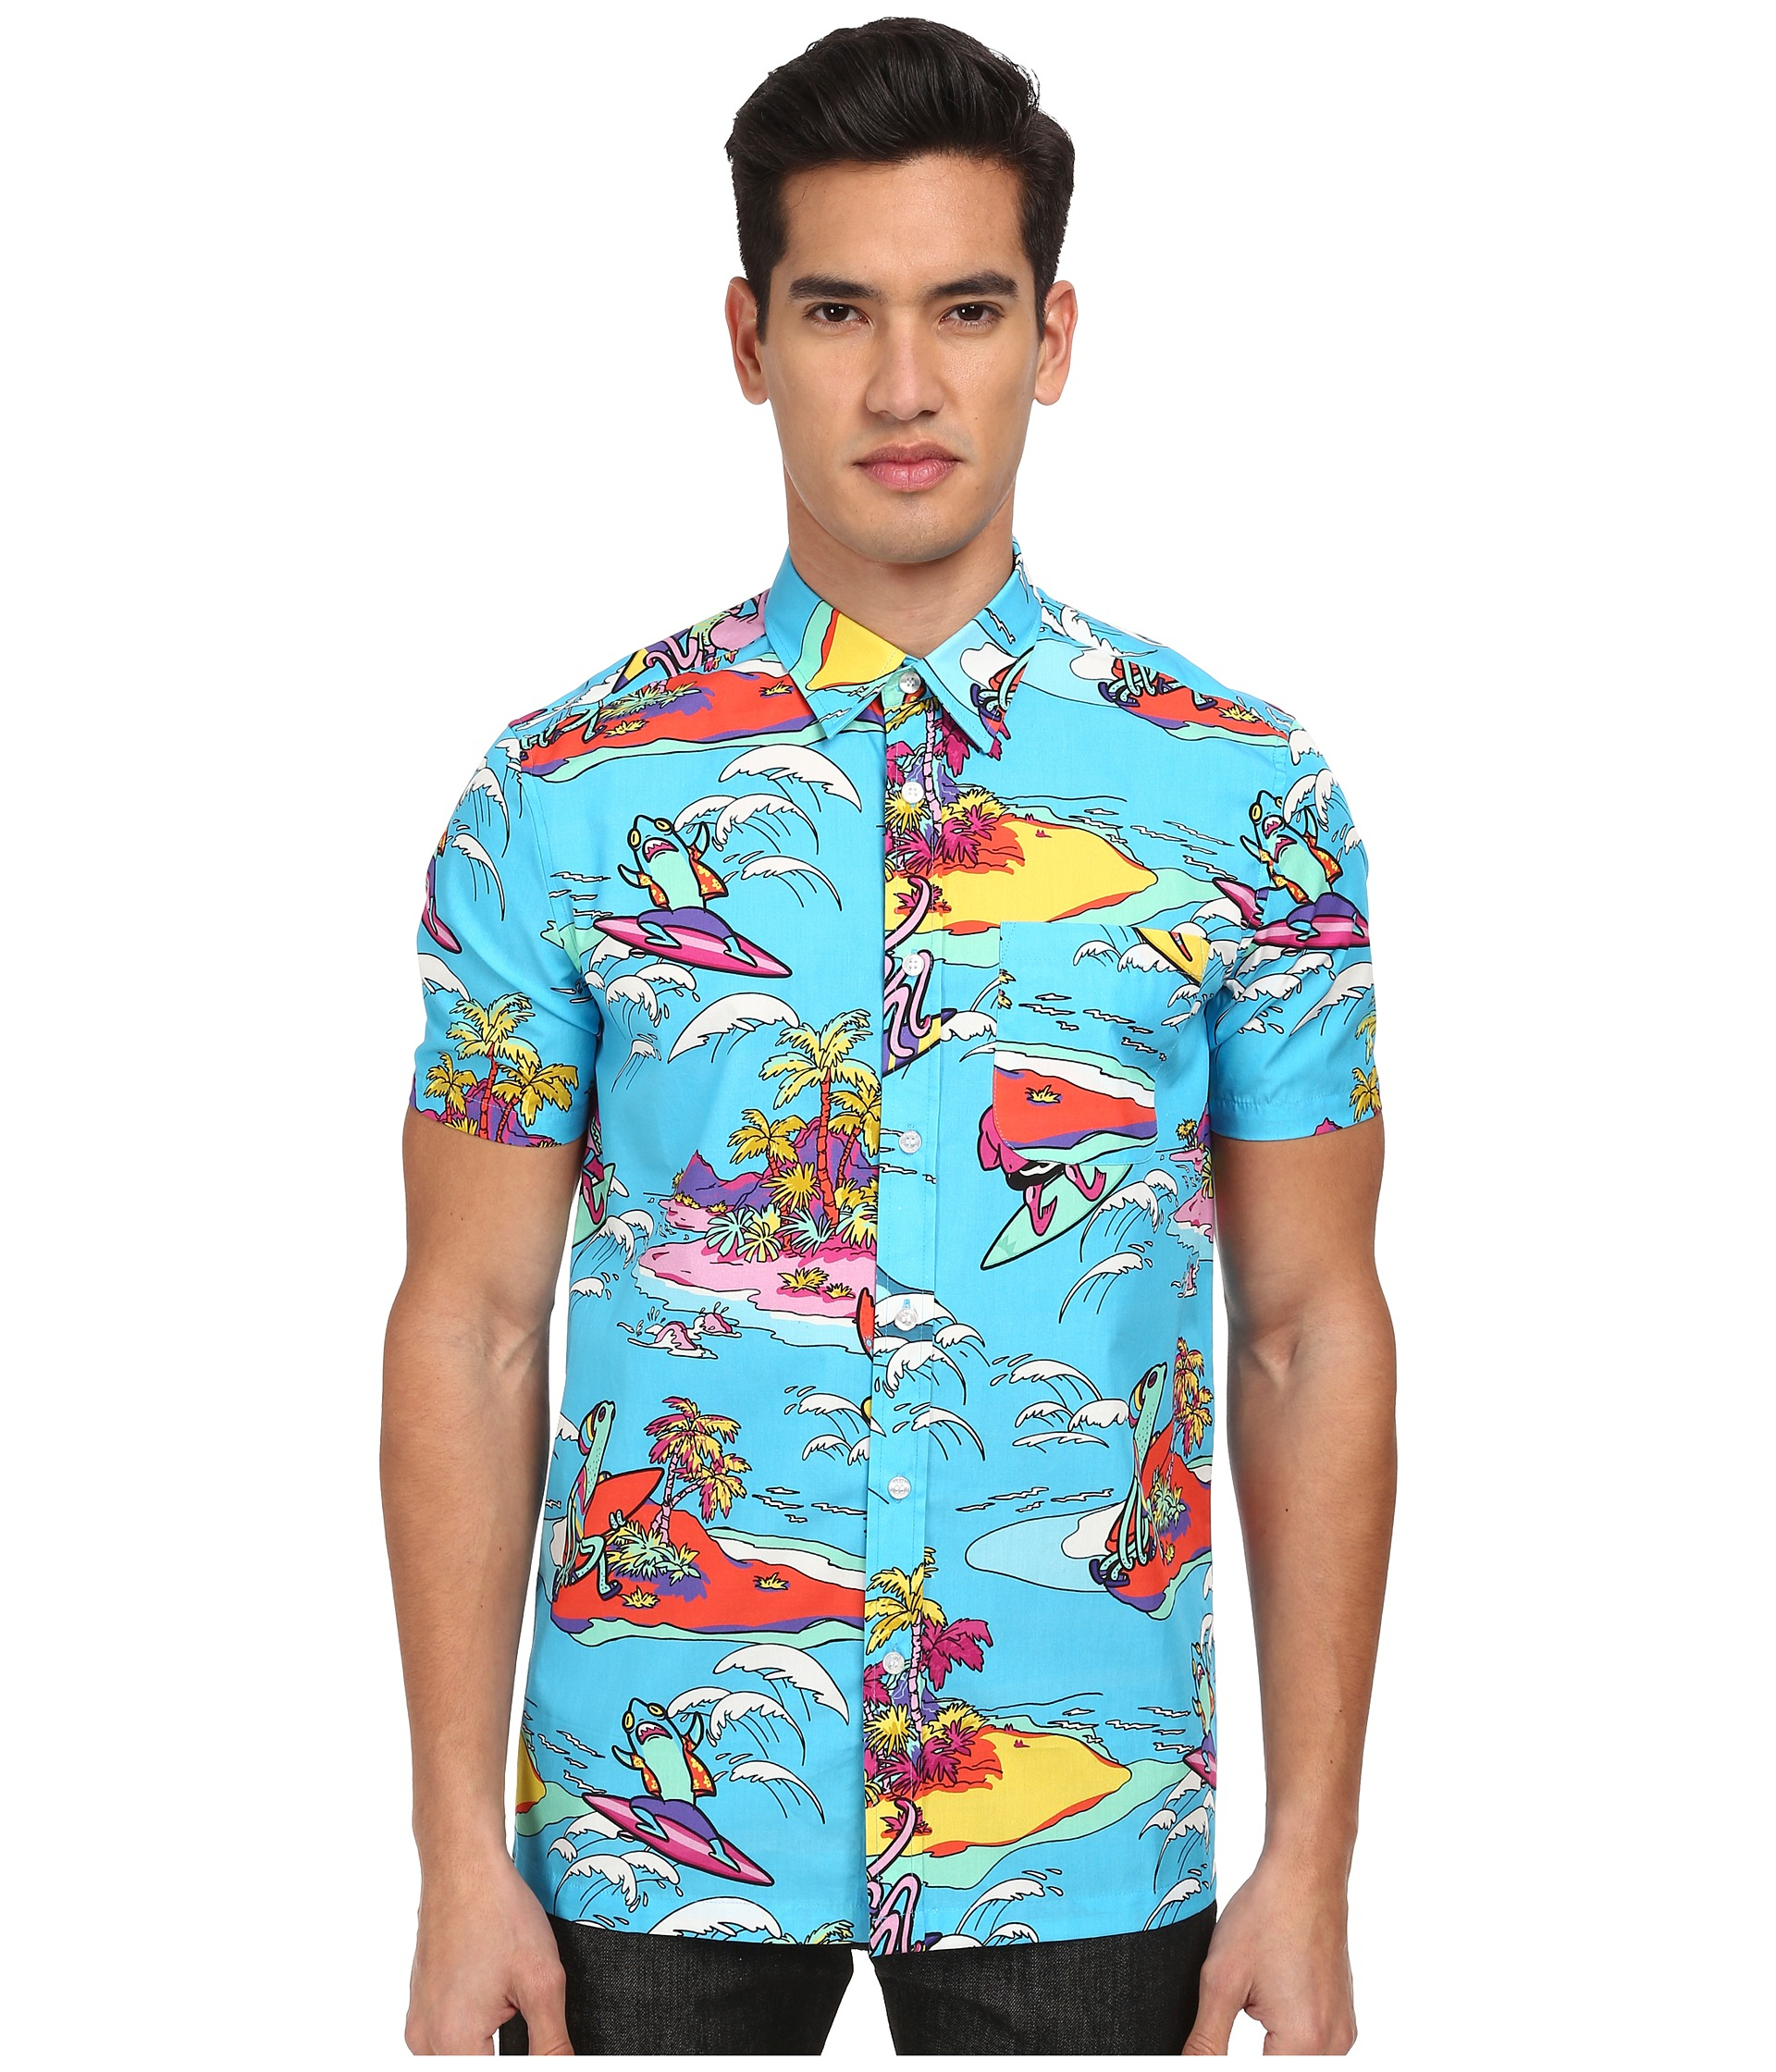 Short sleeve button up shirts for men custom shirt Short sleeve button shirt